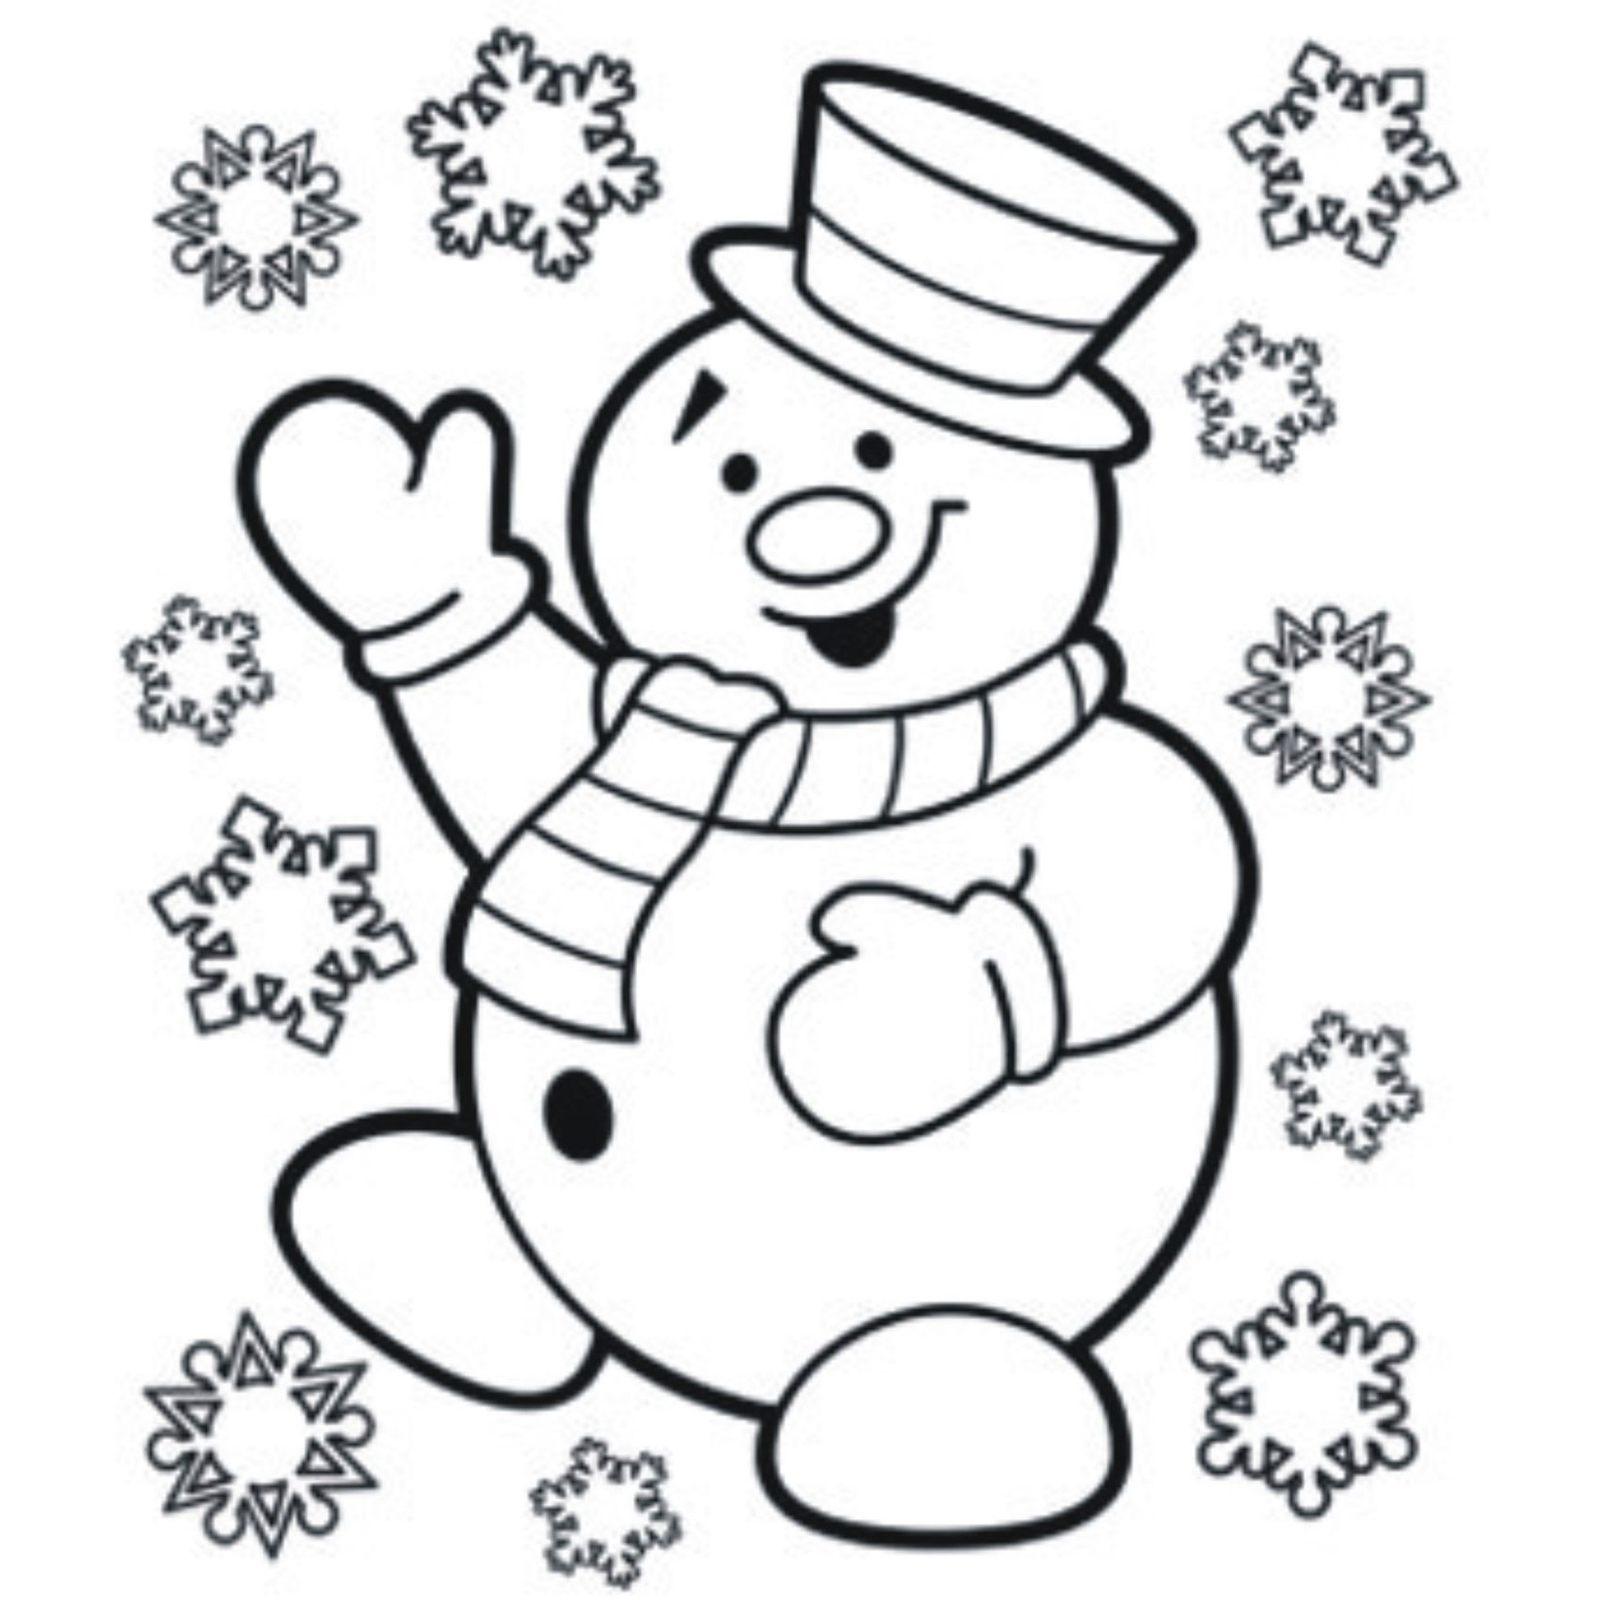 childrens coloring pages snowman shape - photo#19